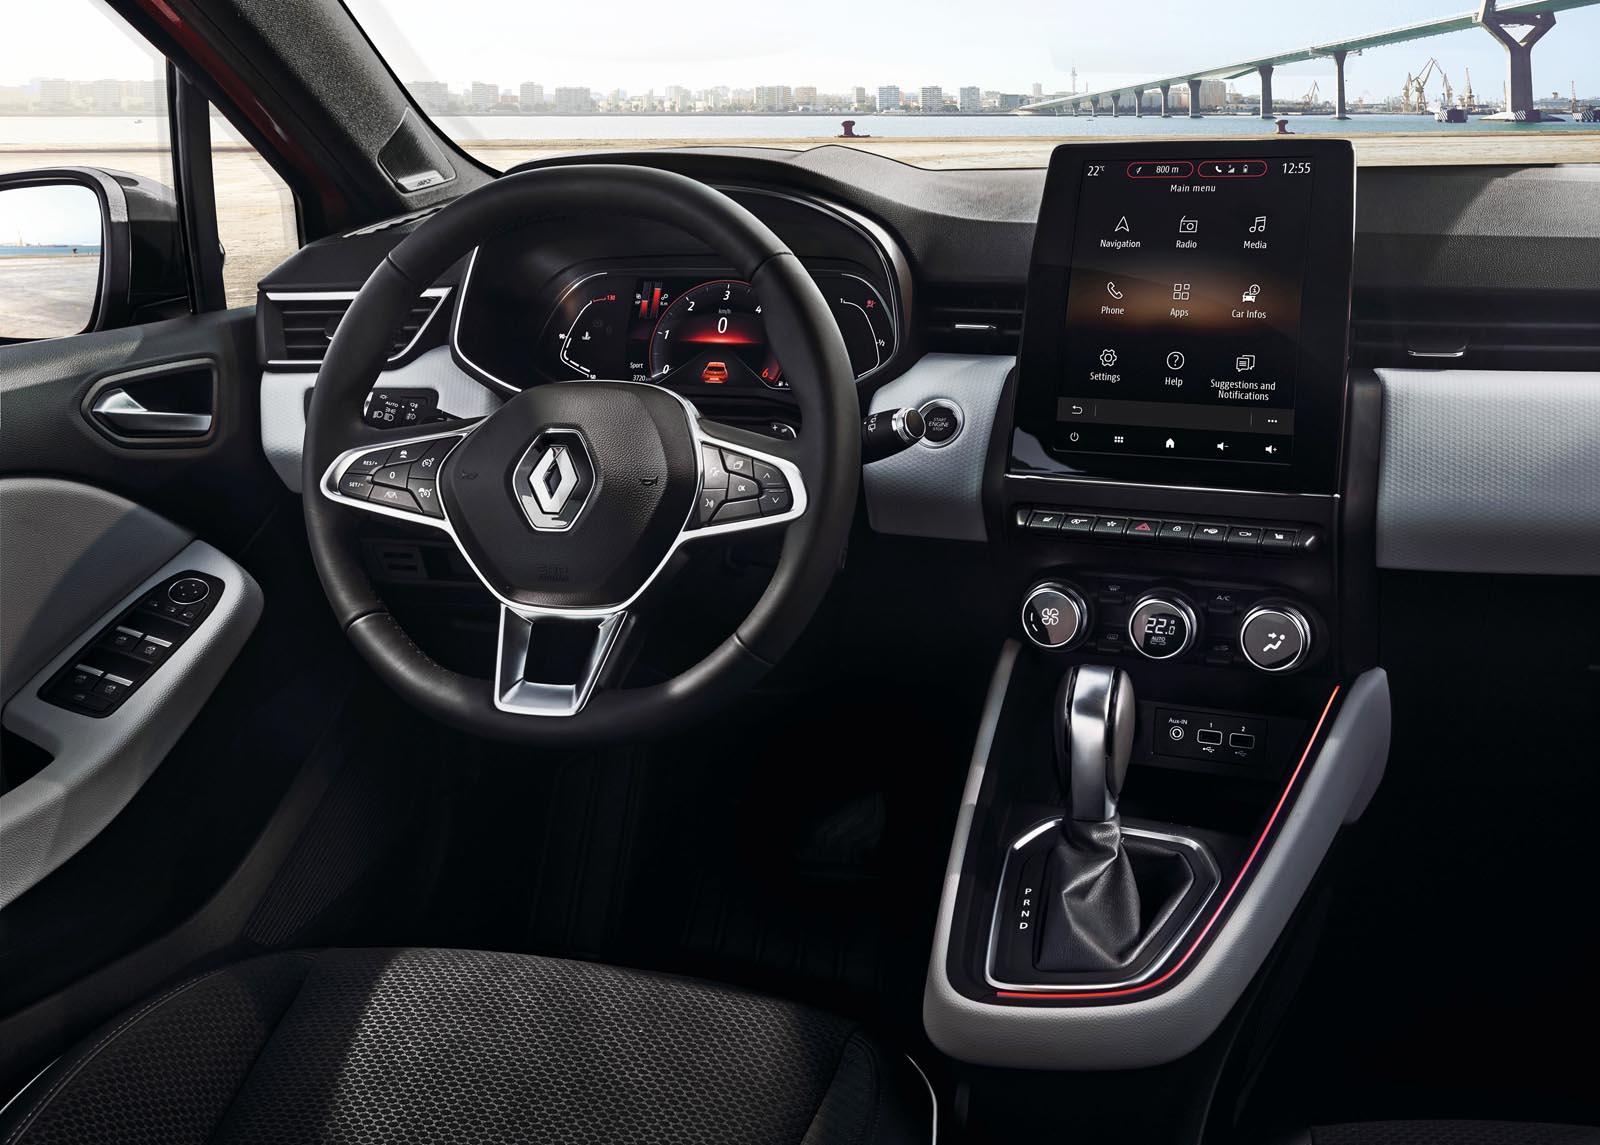 Photo of H Renault αποκαλύπτει το εσωτερικό του νέου Clio [vid]